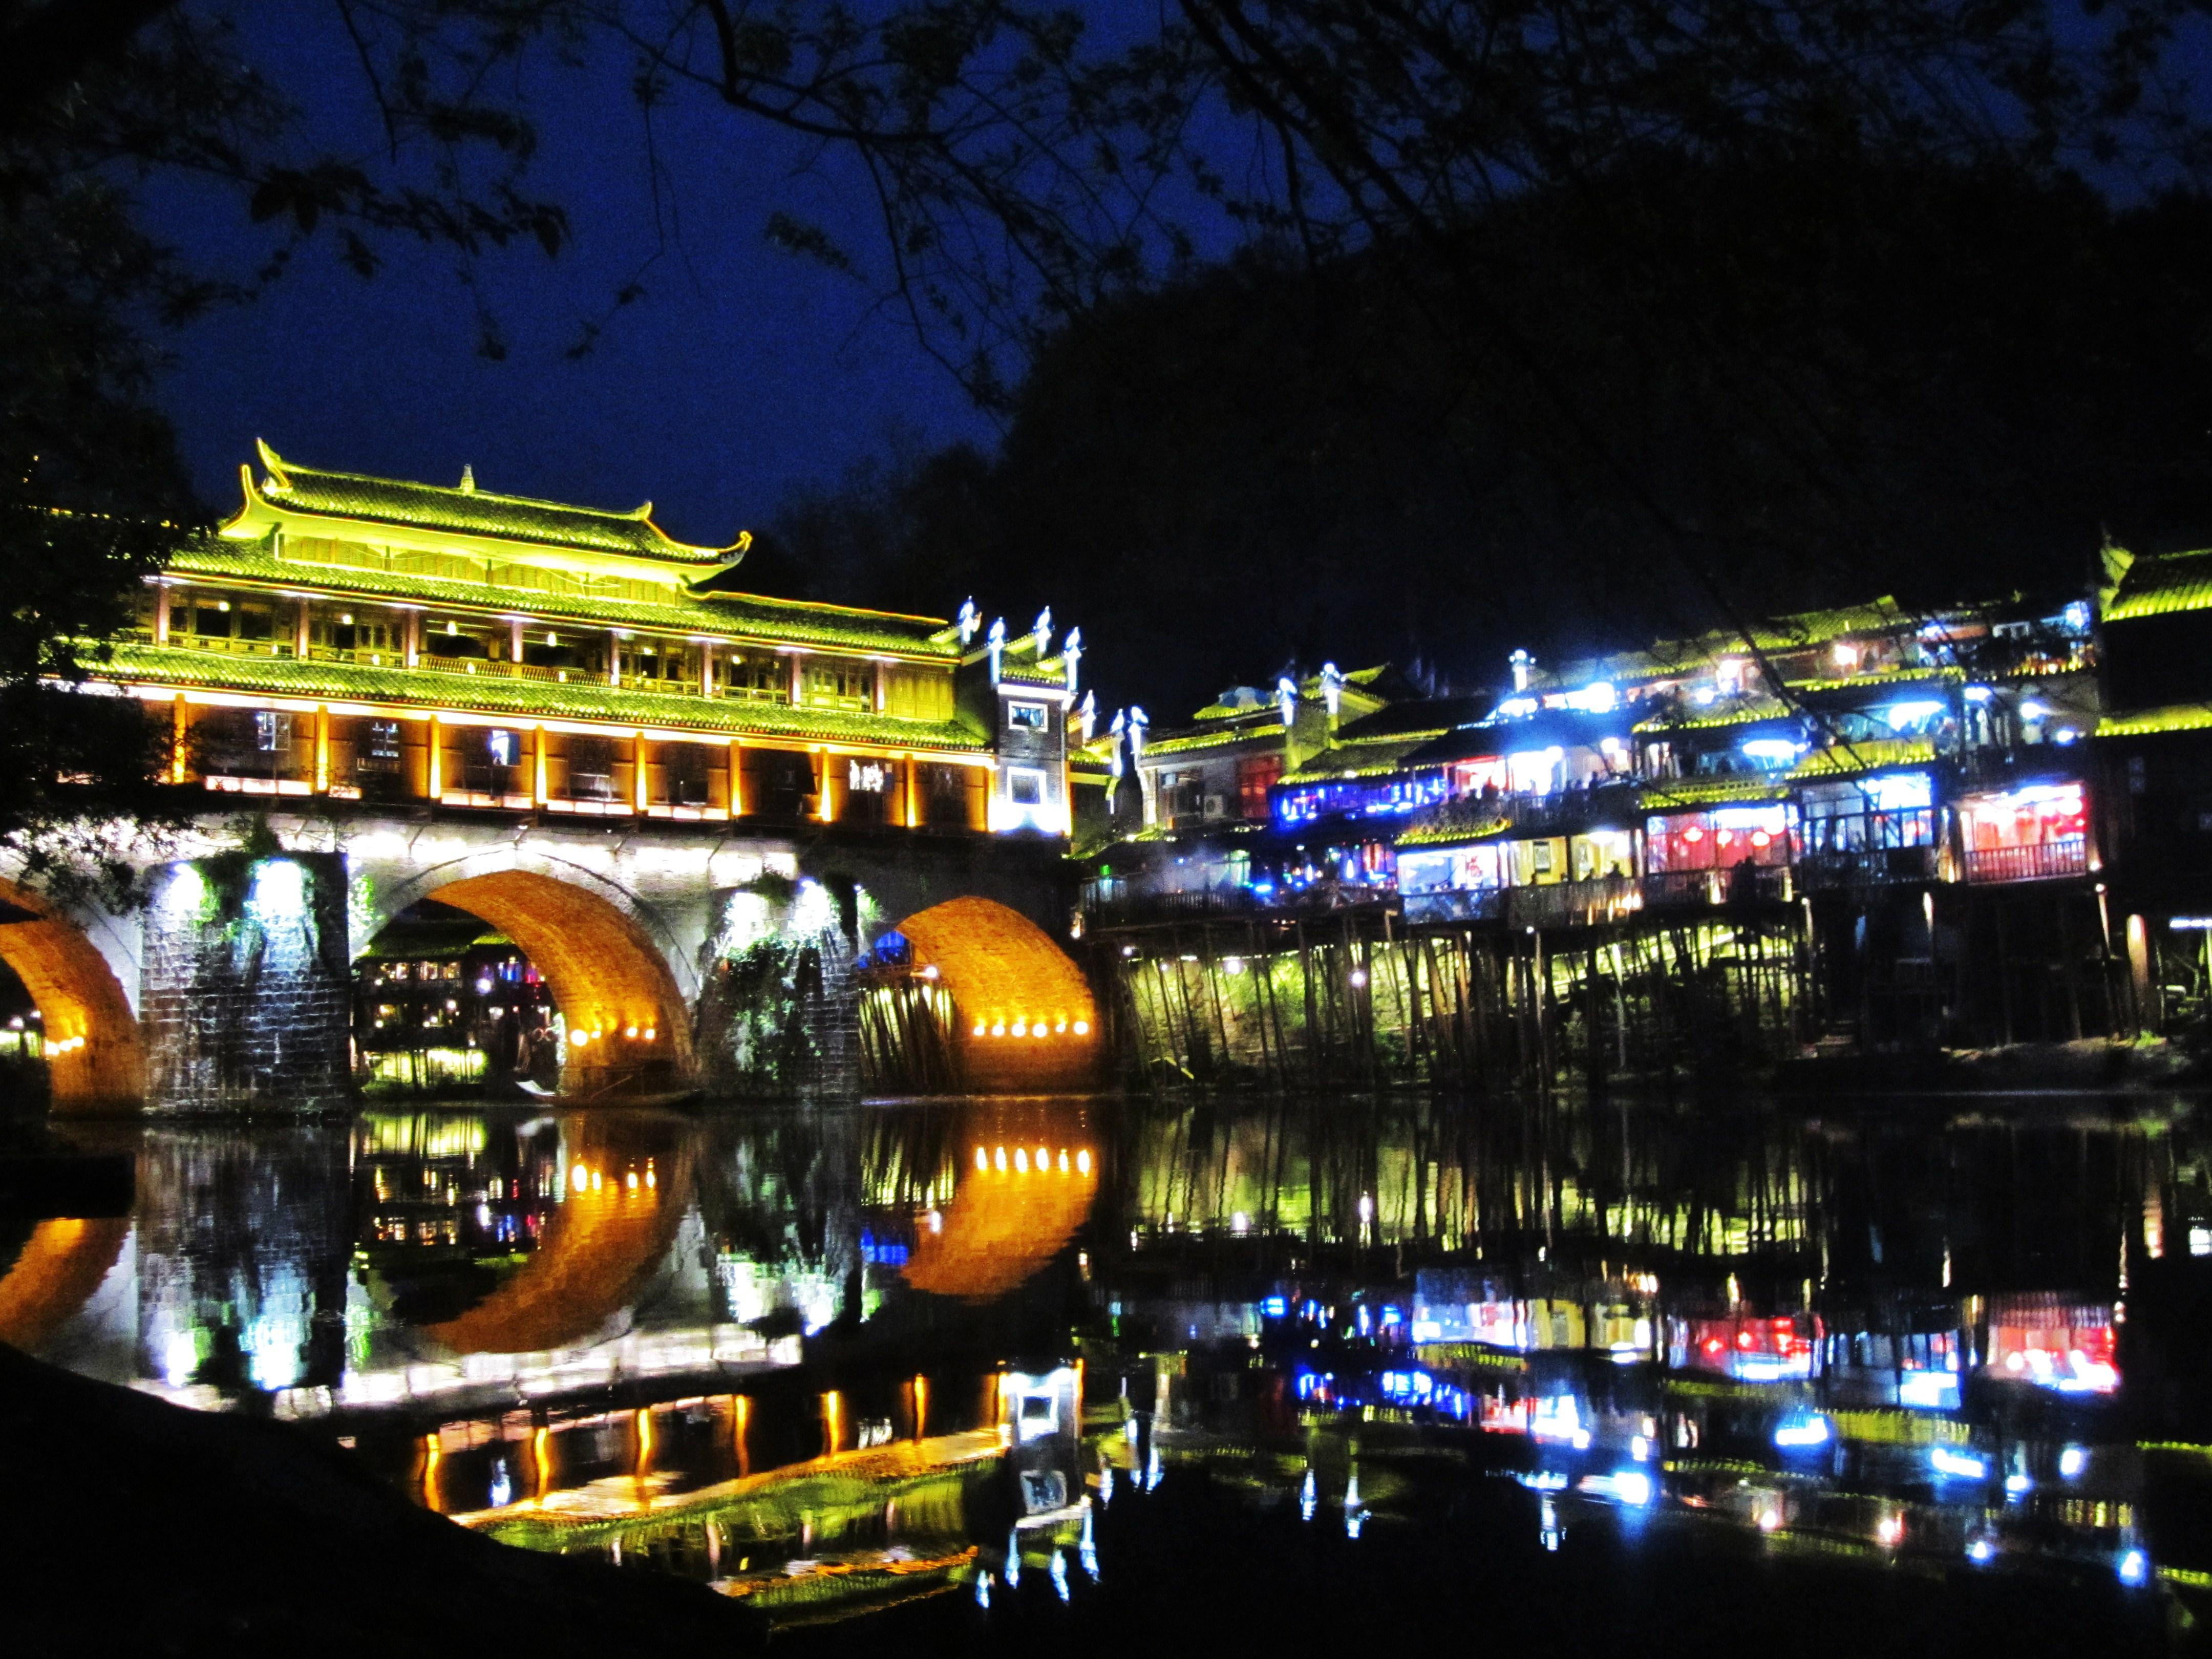 Hong Bridge, Fenghuang, Hunan China